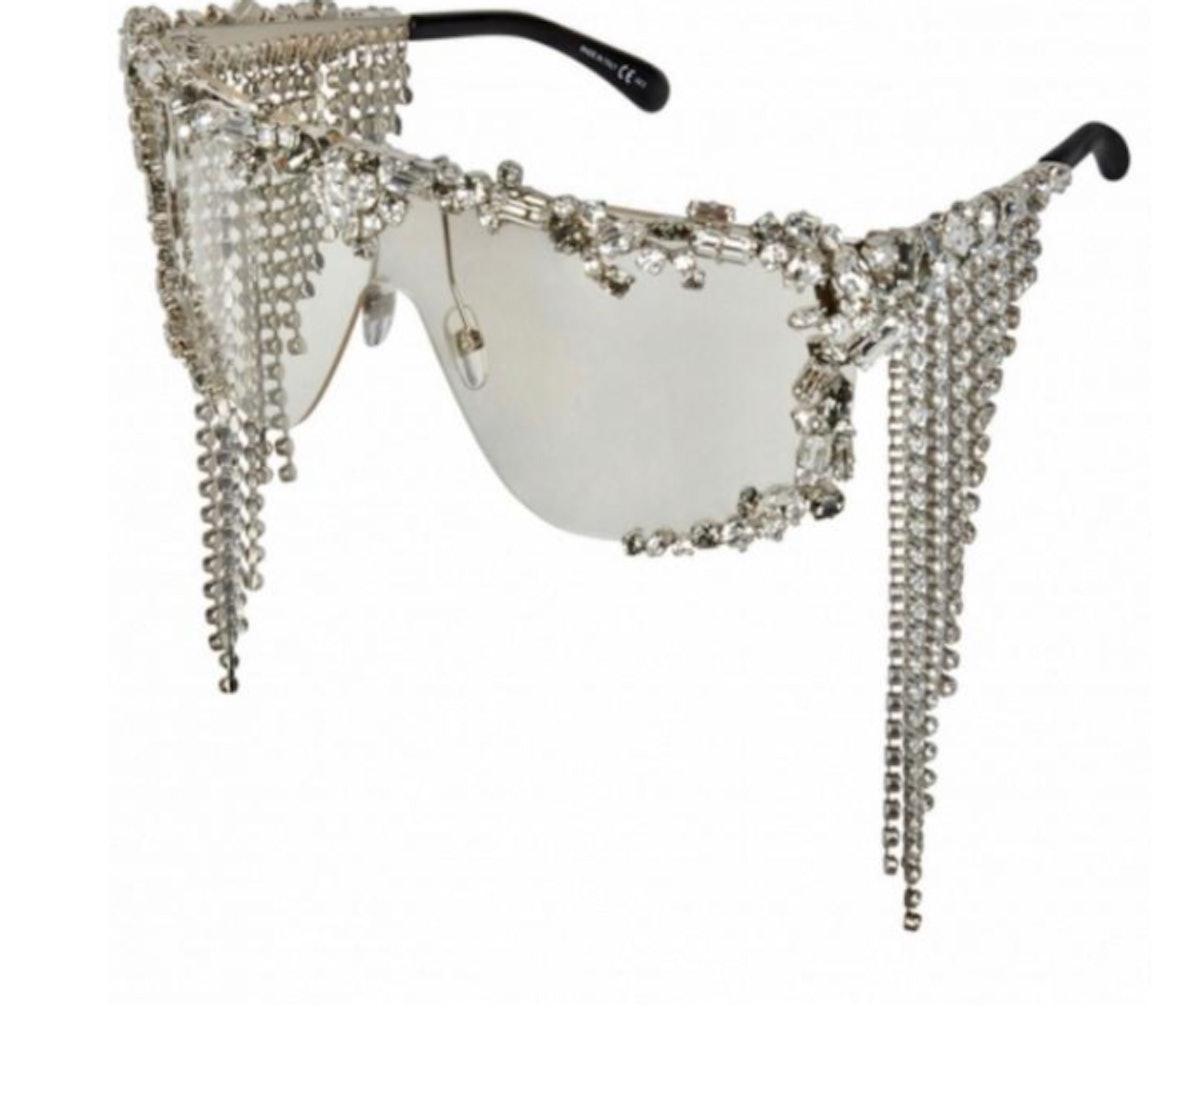 Givenchy Swarovski-Encrusted Shower Sunglasses